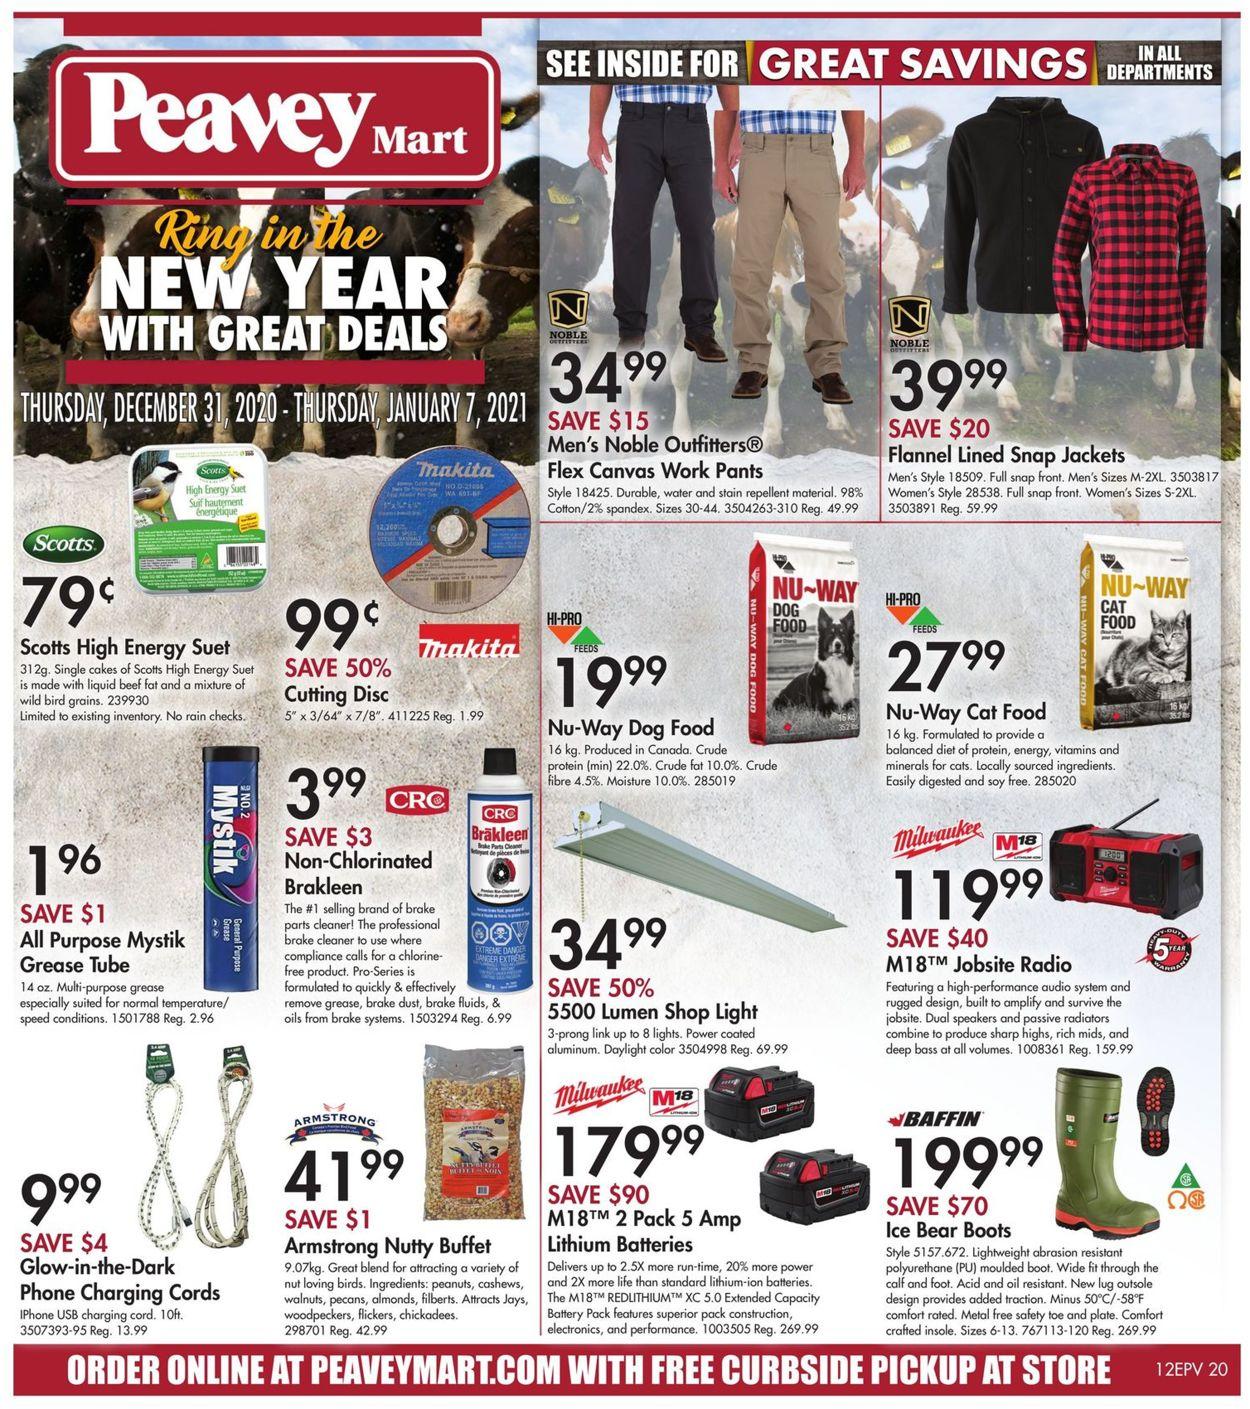 Peavey Mart - New Year 2021 Flyer - 12/31-01/07/2021